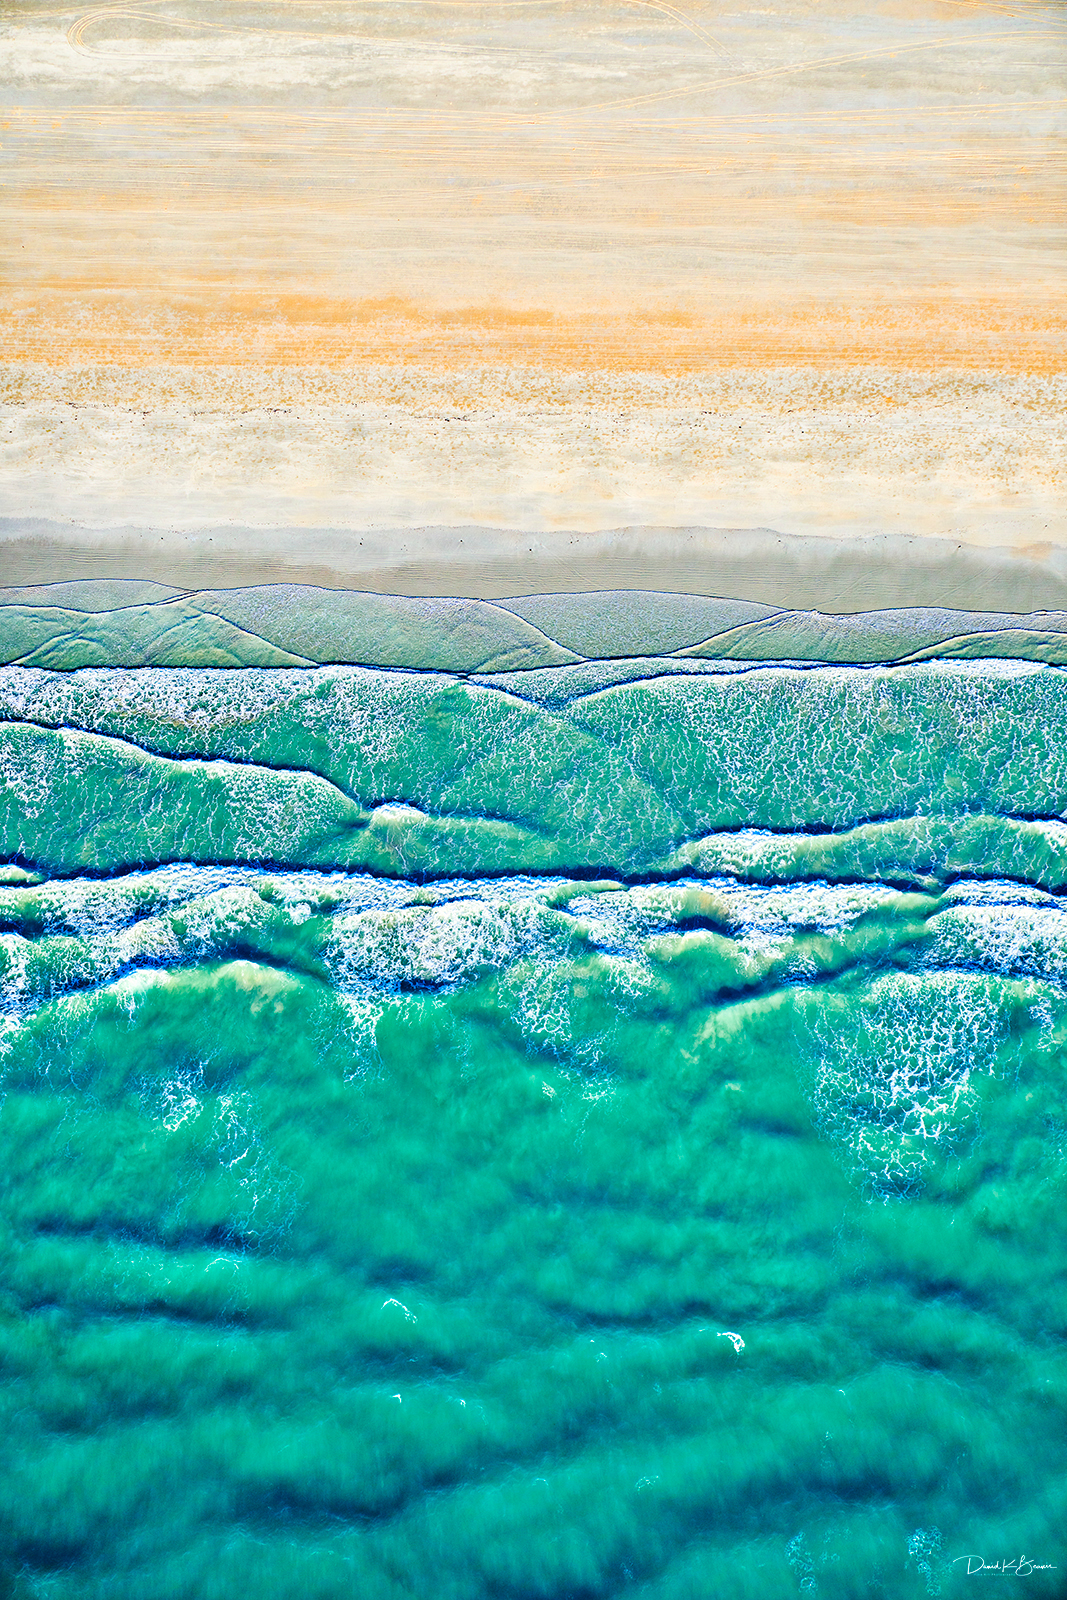 Sand and sea aiwwvk